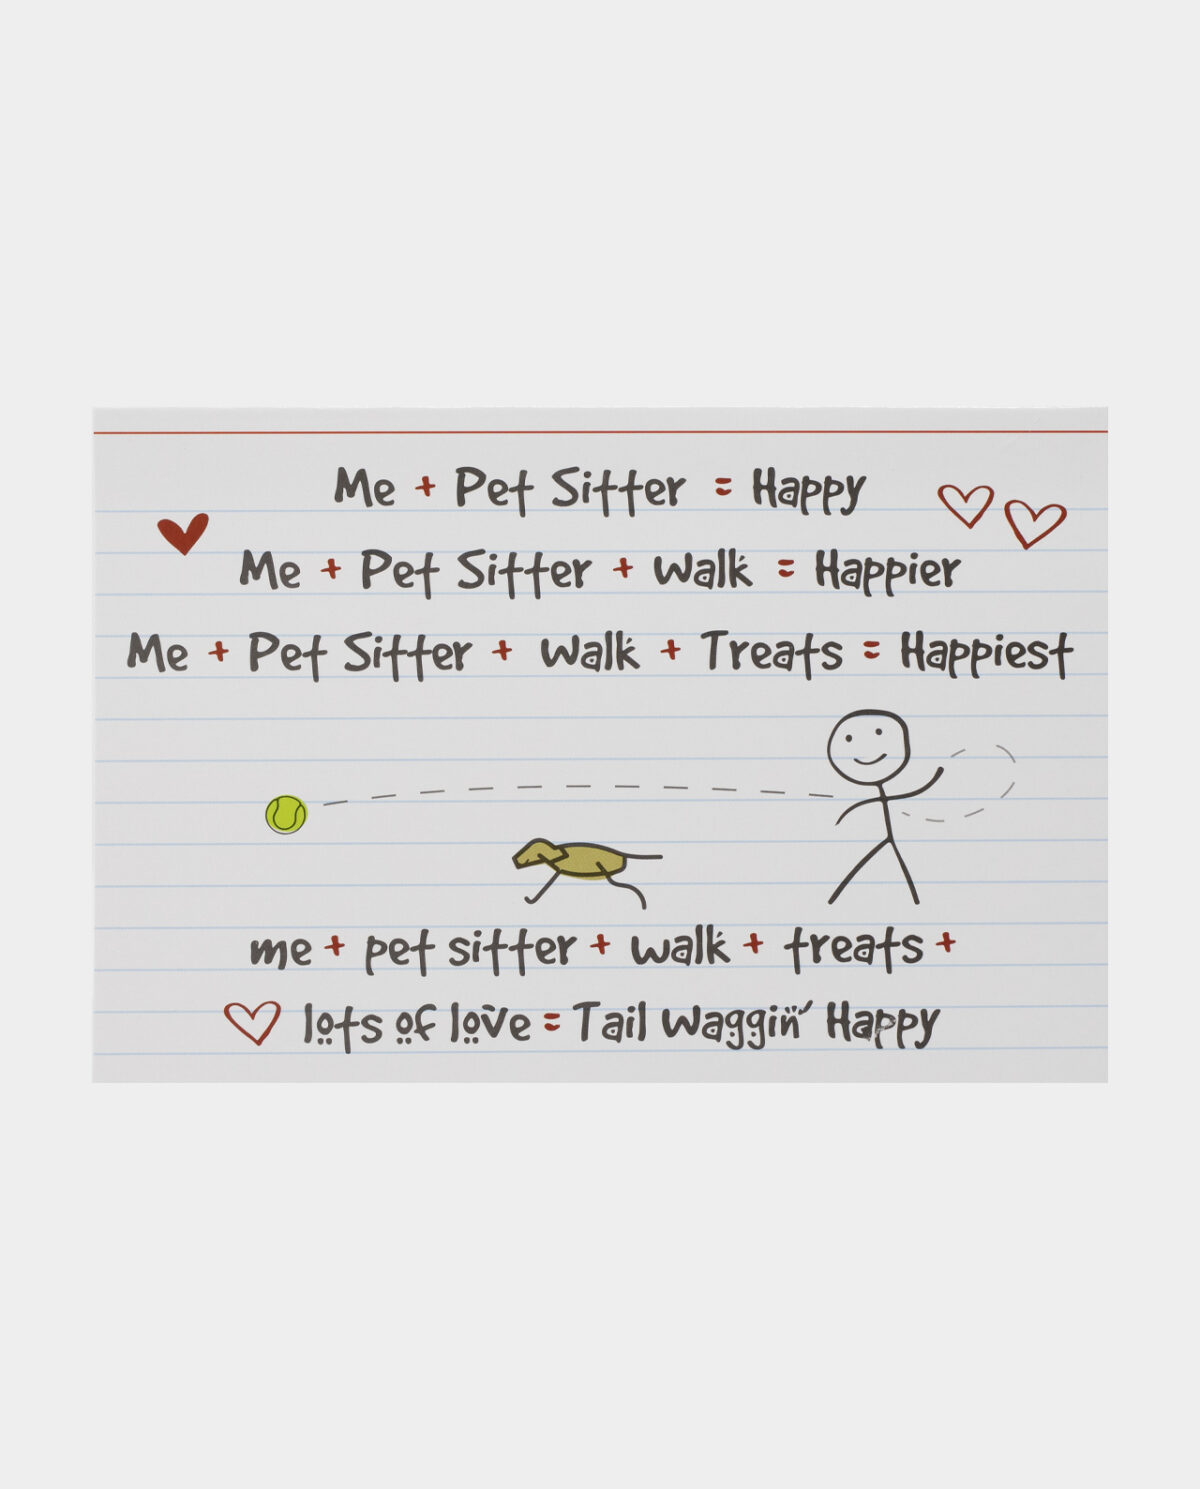 Me + Pet Sitter = Happy